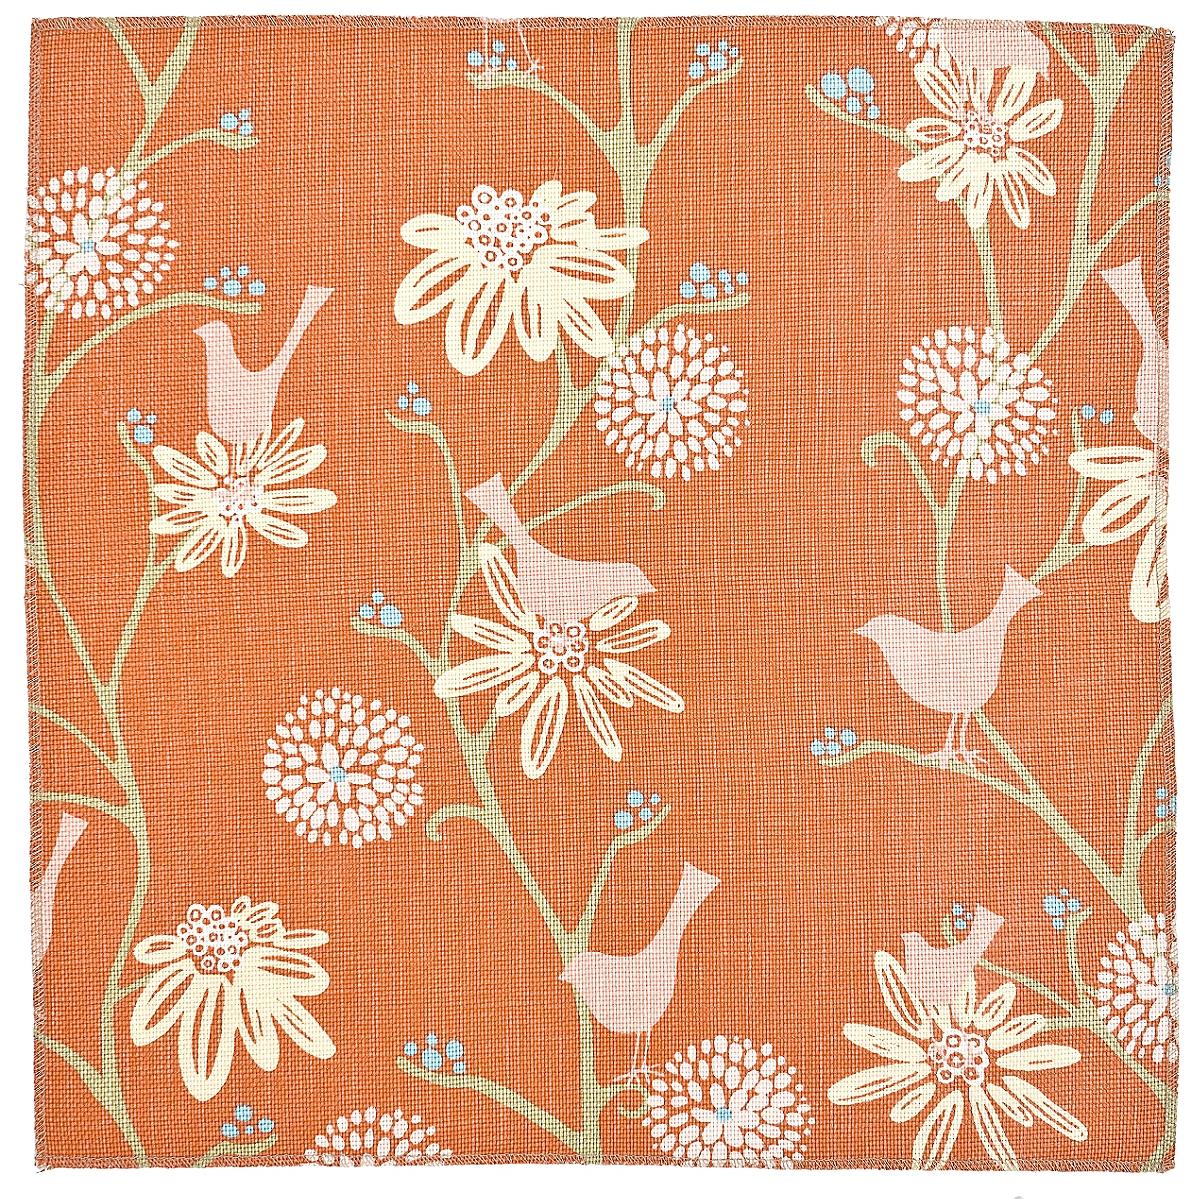 Tweet Suite: Zinnia (fabric yardage)